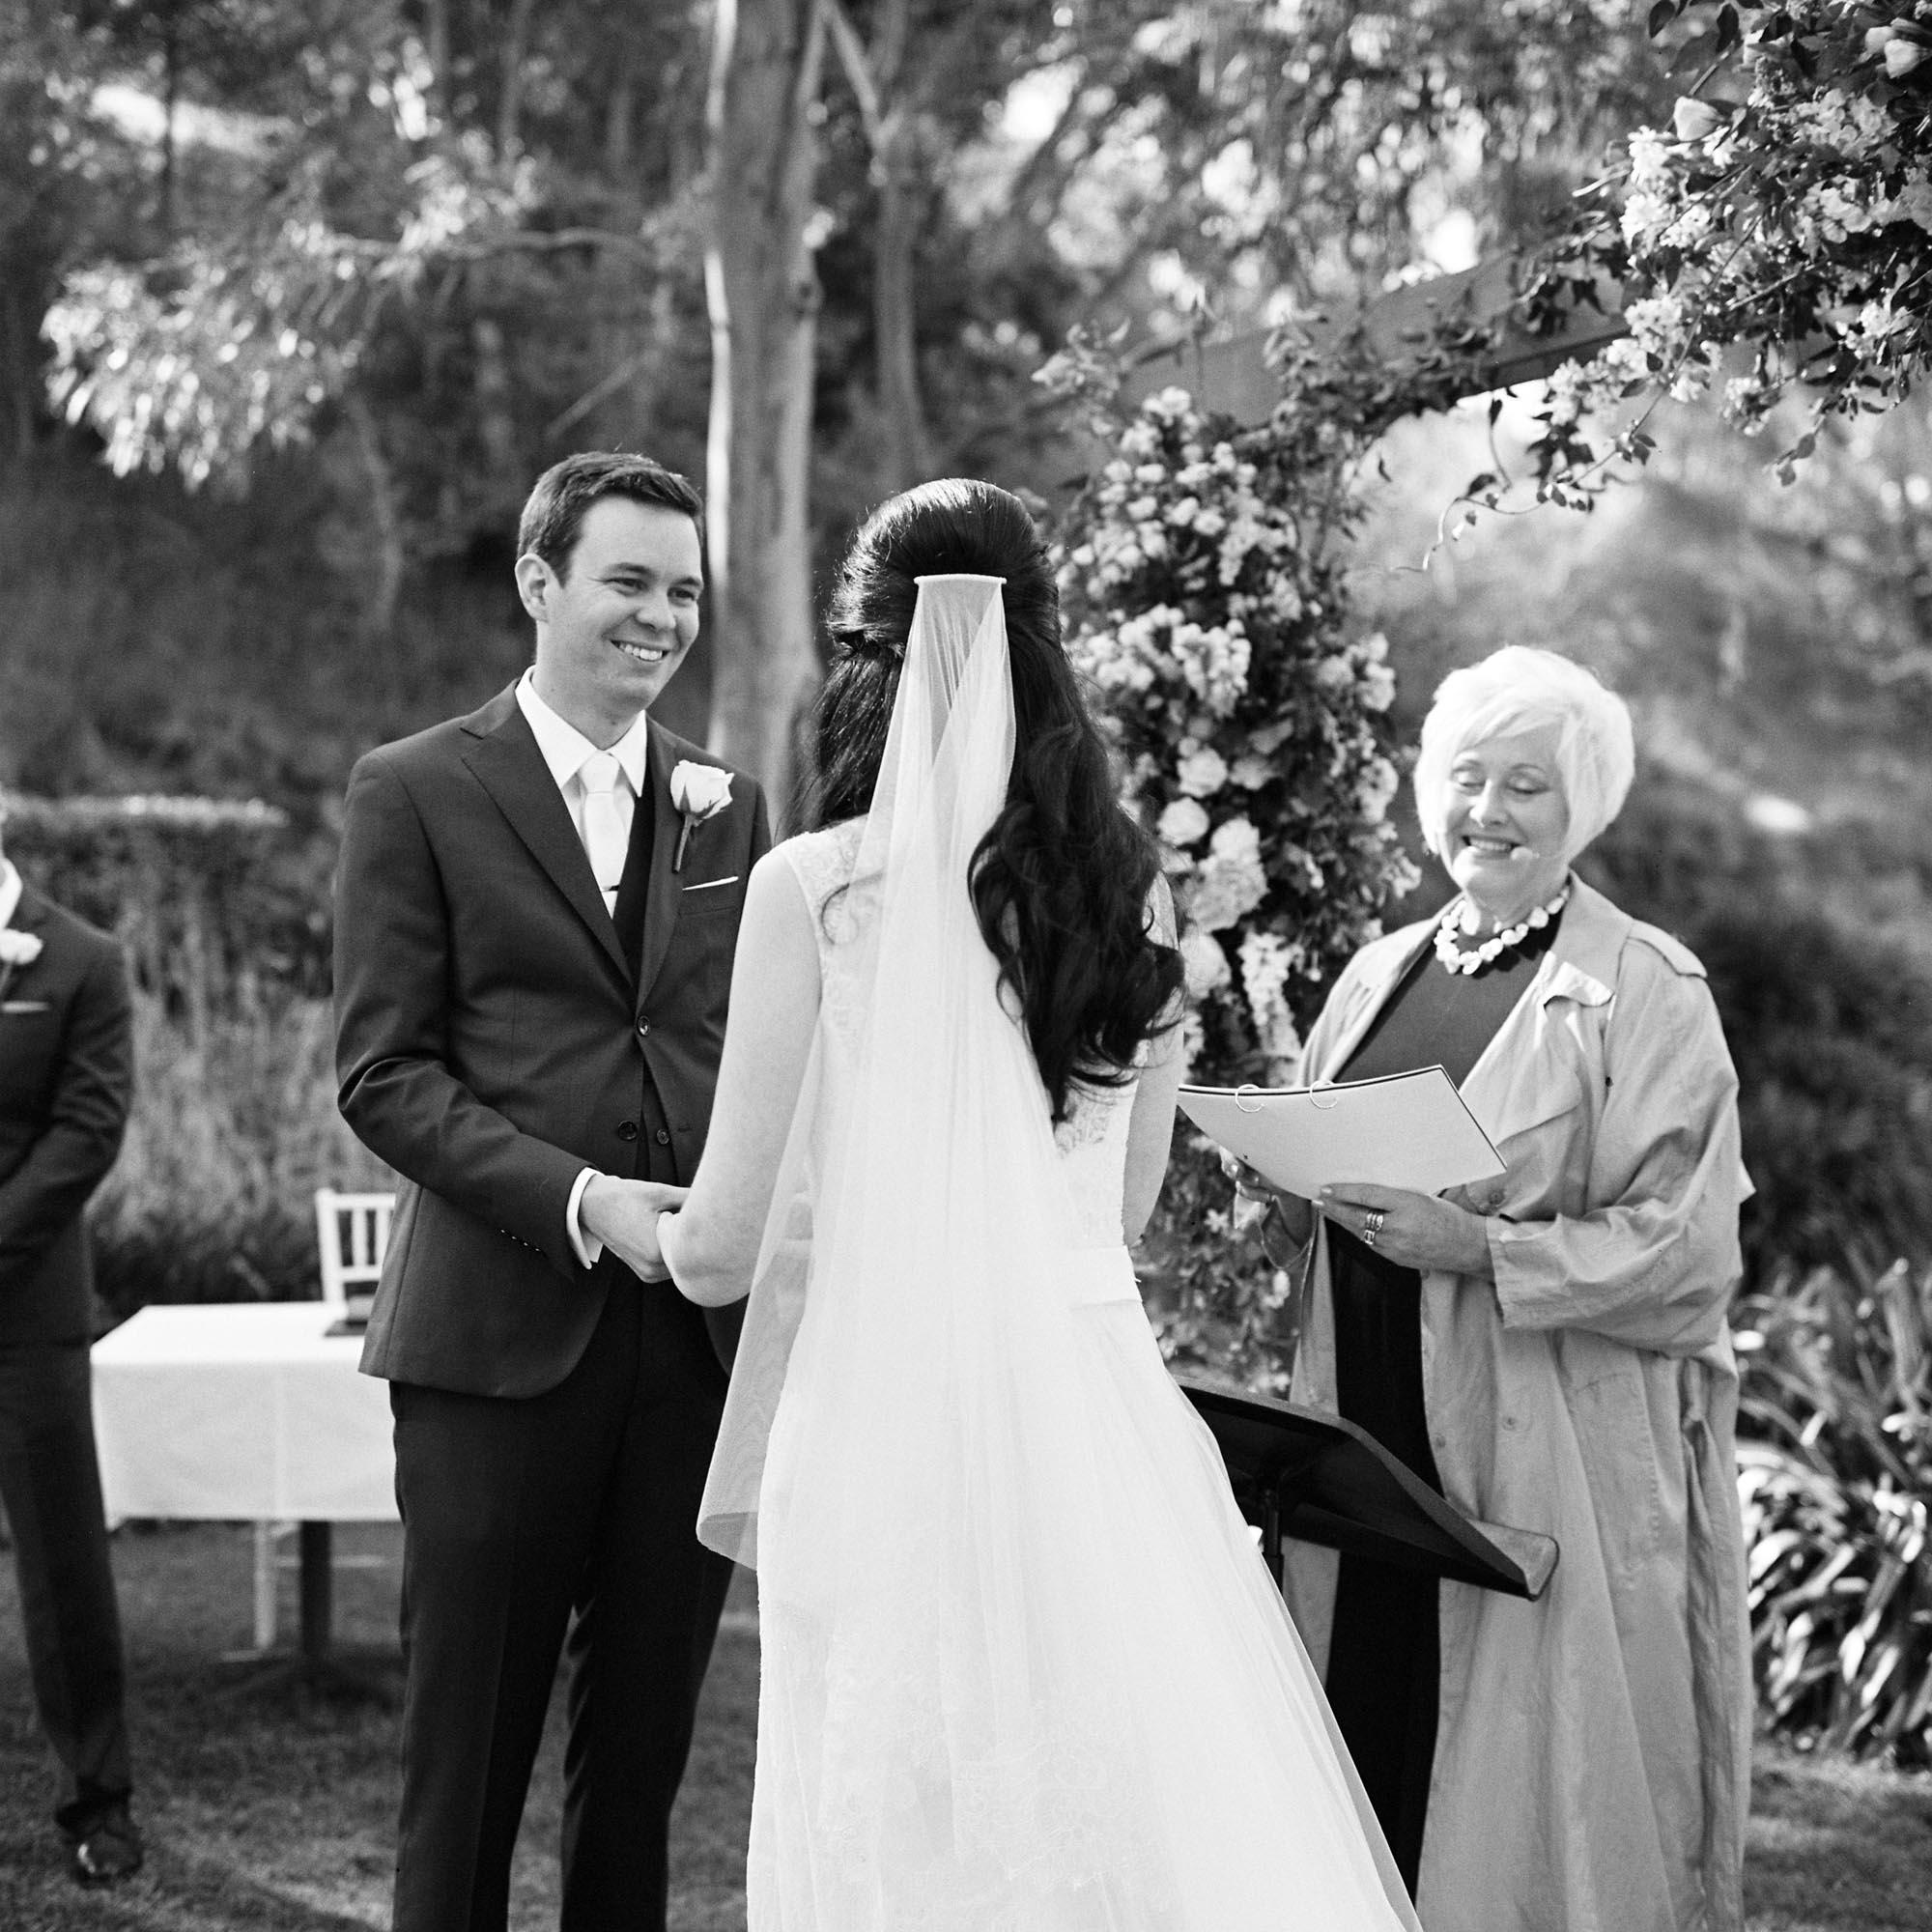 Glen-Ewin-Estate-wedding-photography-039.jpg